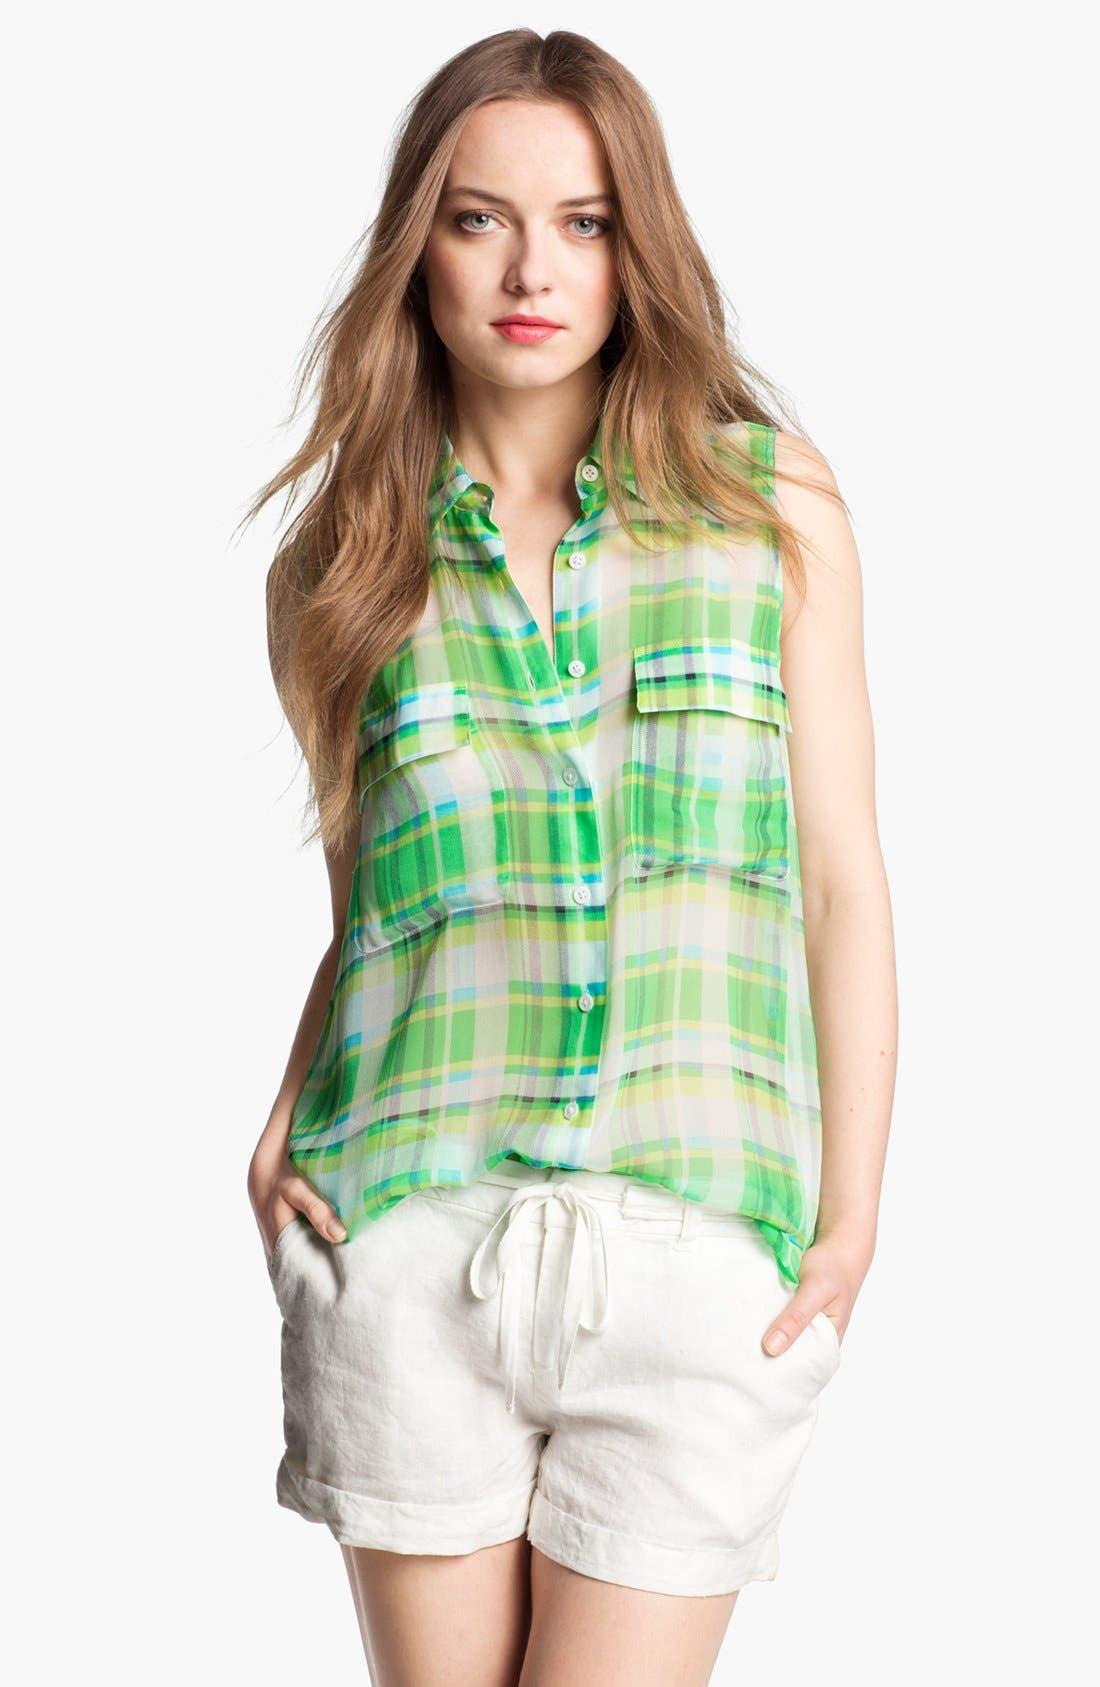 Alternate Image 1 Selected - Equipment 'Signature' Sleeveless Silk Shirt